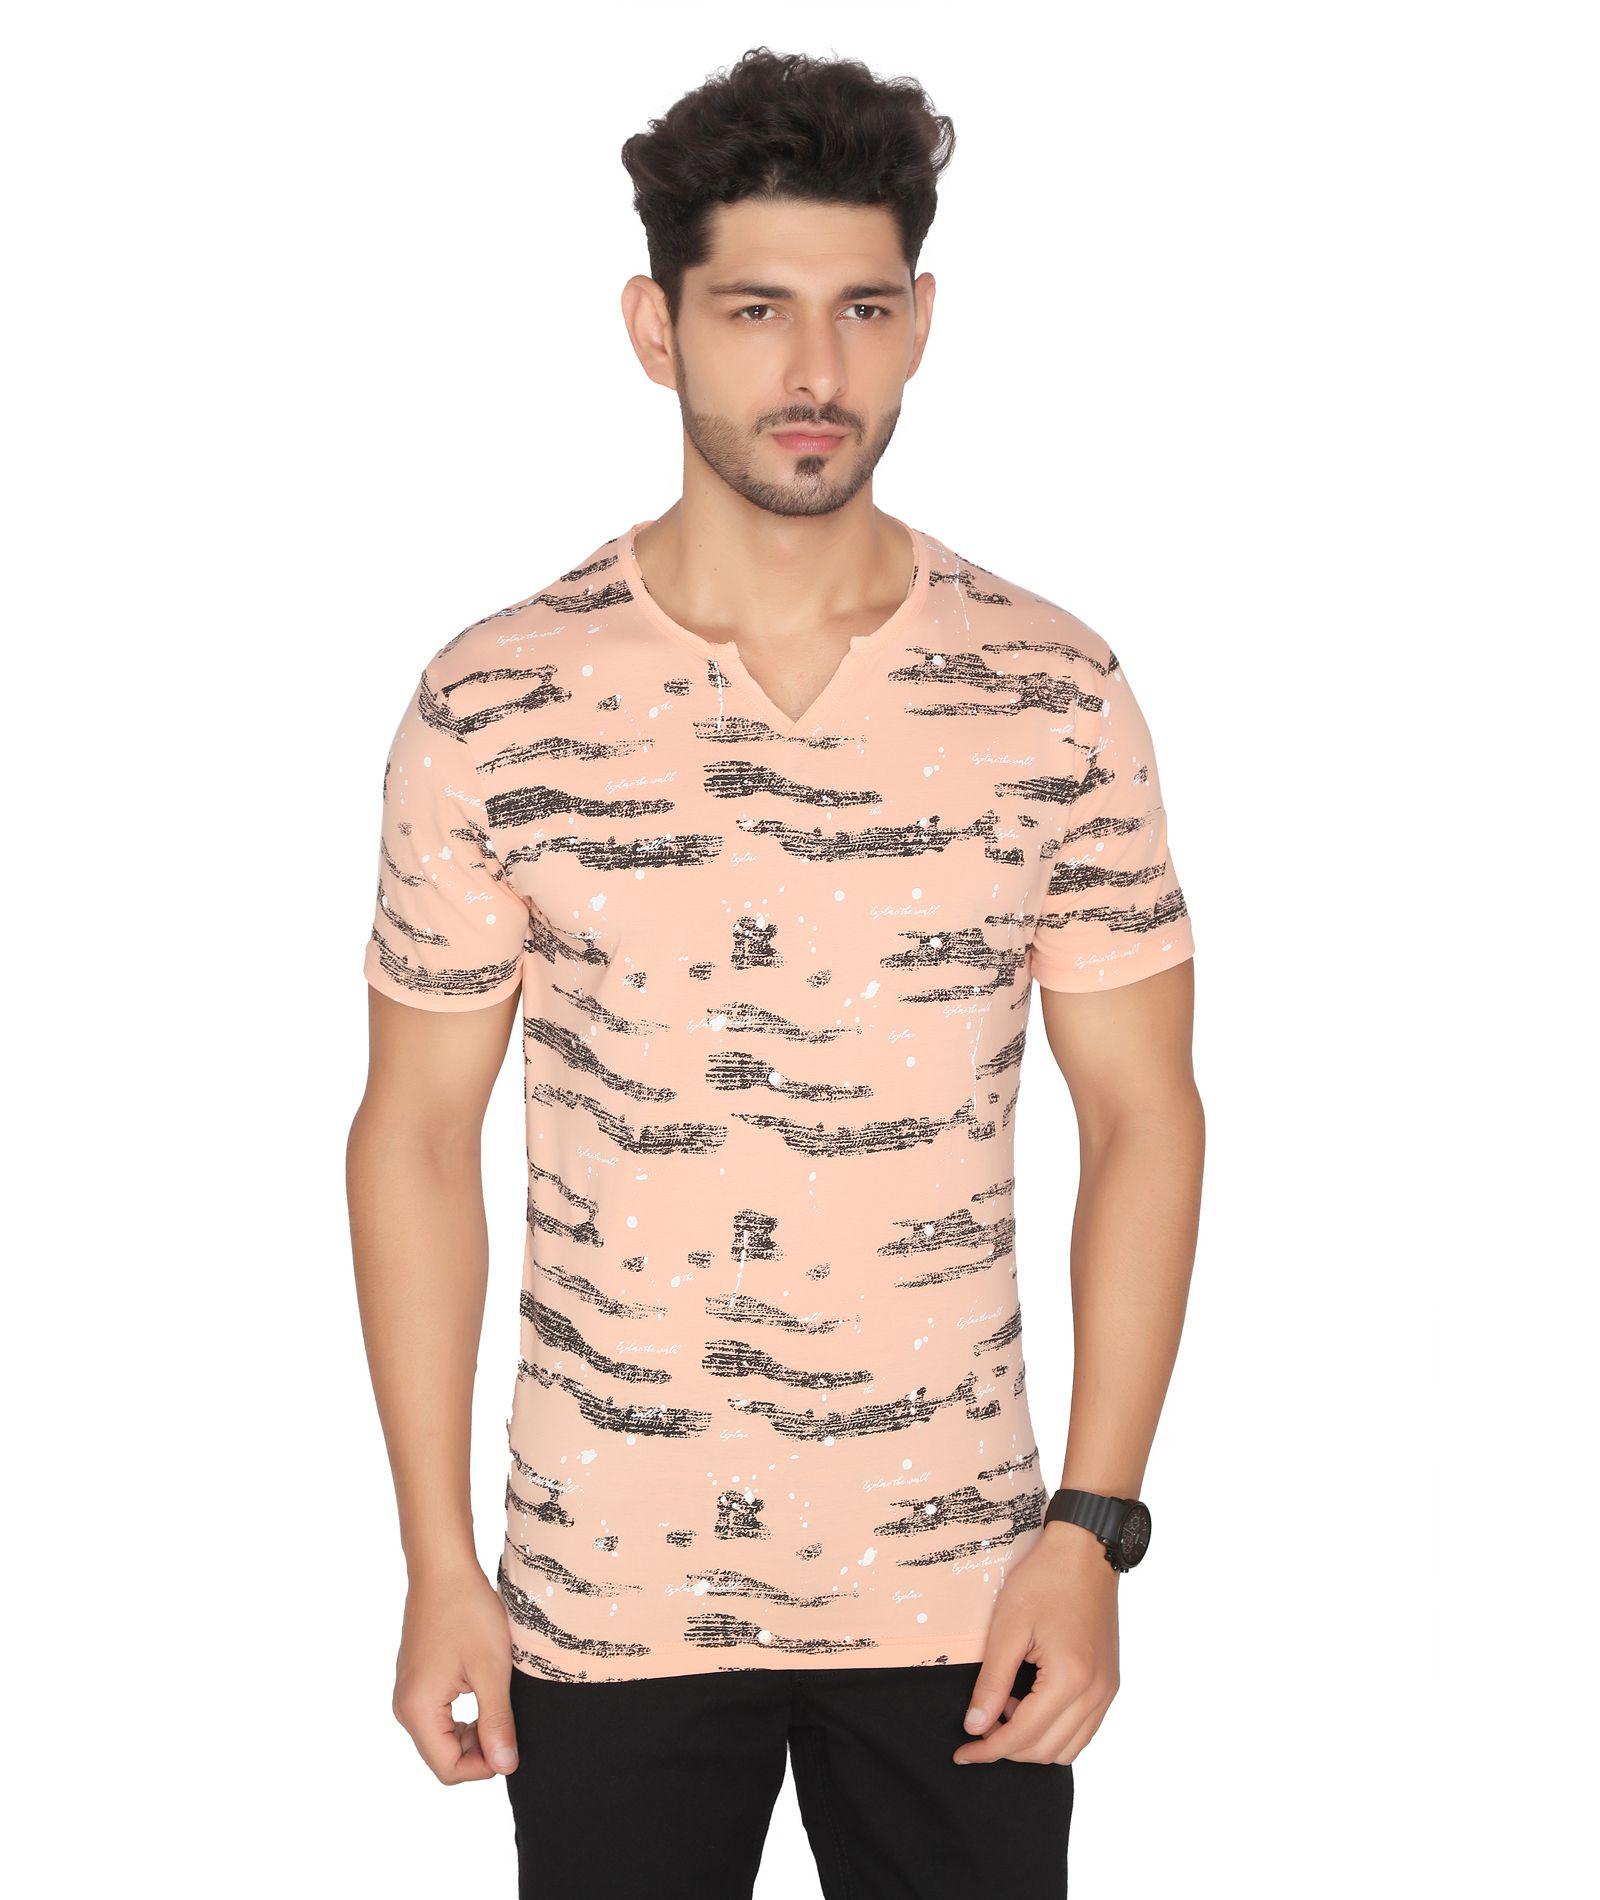 NEXGEN CLUB Cotton Blend Peach Printed T-Shirt